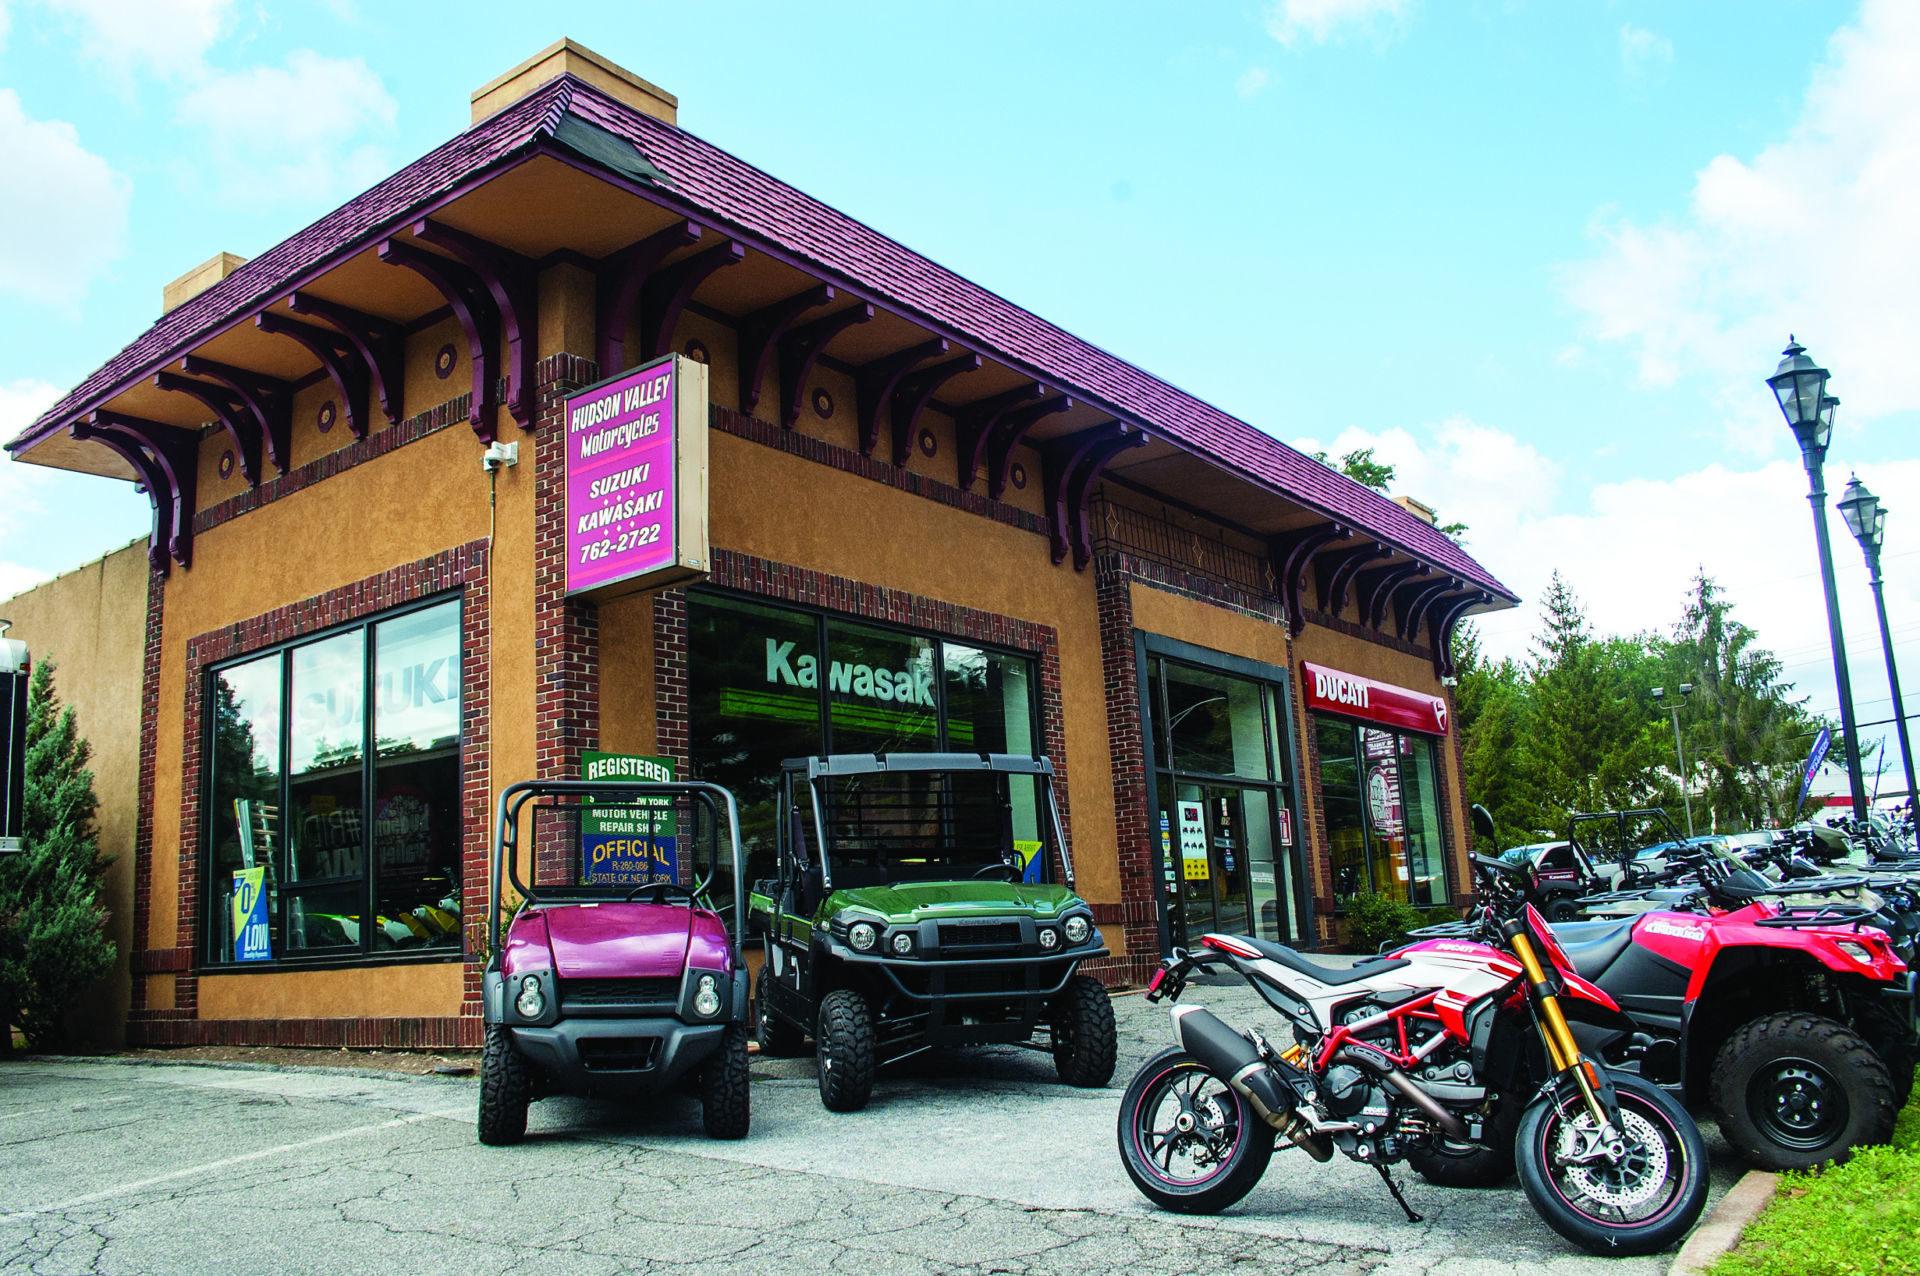 u s motorcycle sales boom amid pandemic roadracing world magazine motorcycle riding racing tech news u s motorcycle sales boom amid